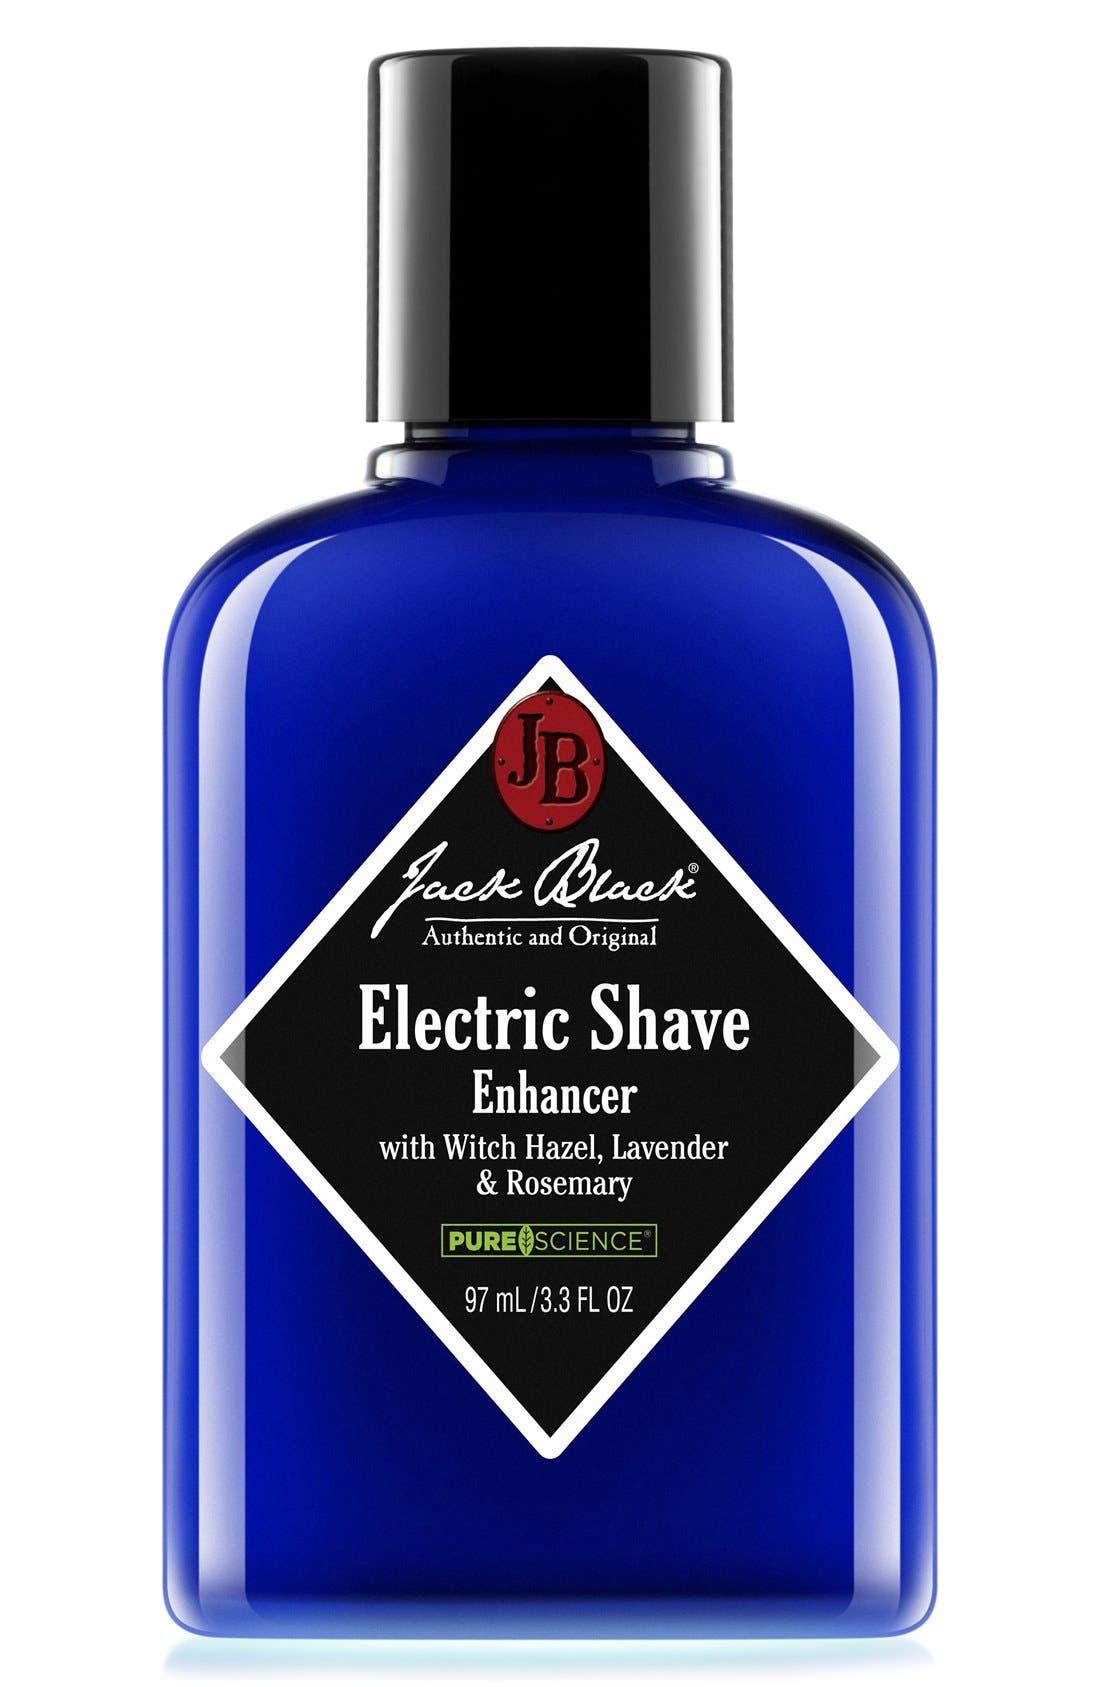 Jack Black Electric Shave Enhancer with Witch Hazel, Lavender & Rosemary